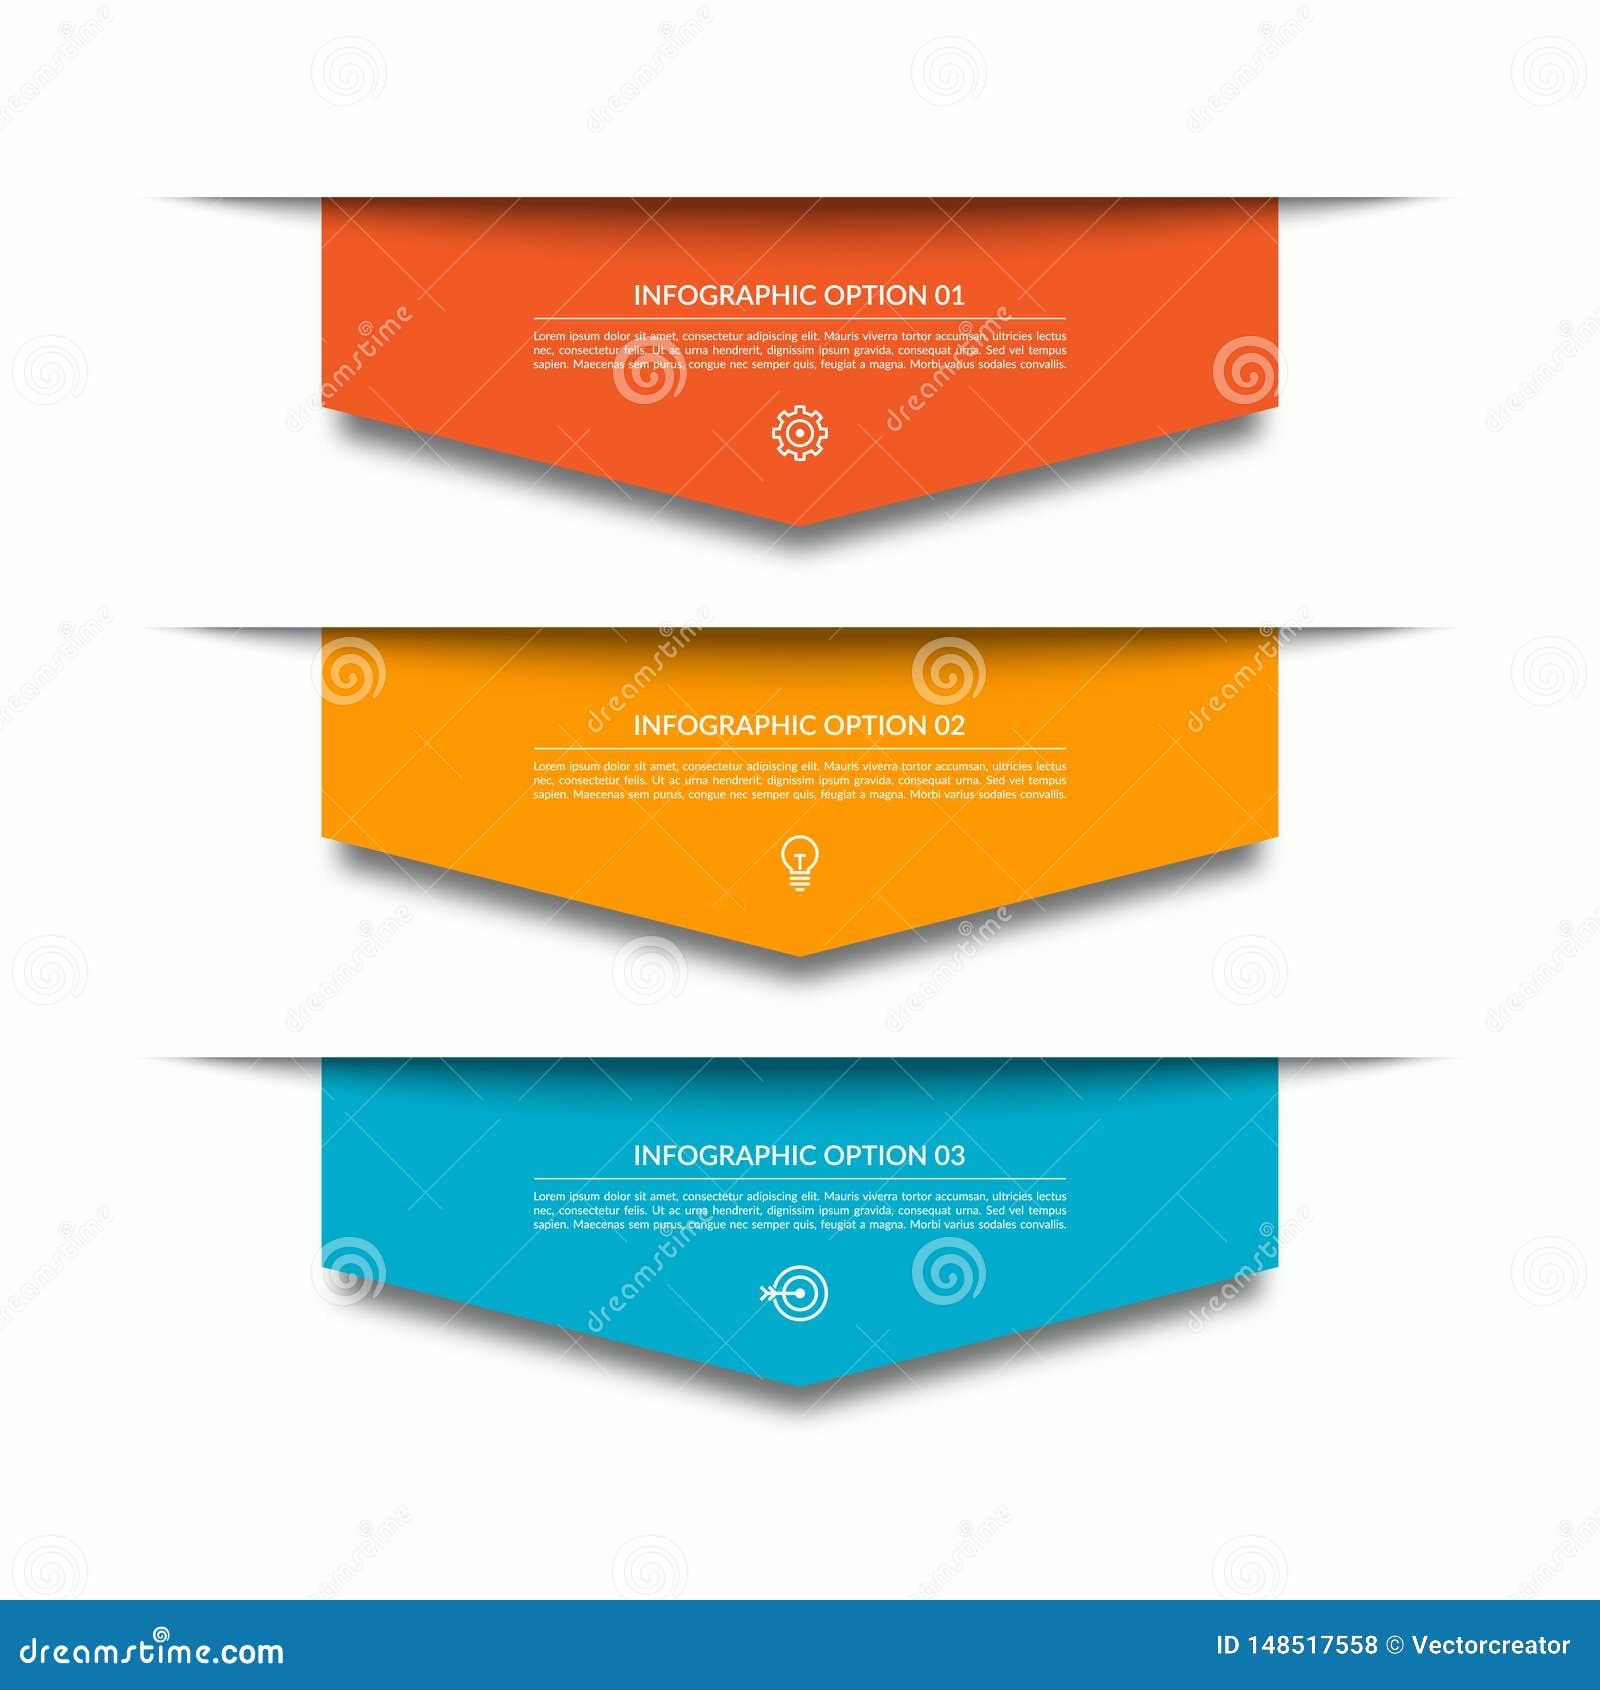 Molde de Infographic com as 3 setas de papel coloridas descendentes Pode ser usado para o diagrama, carta, design web